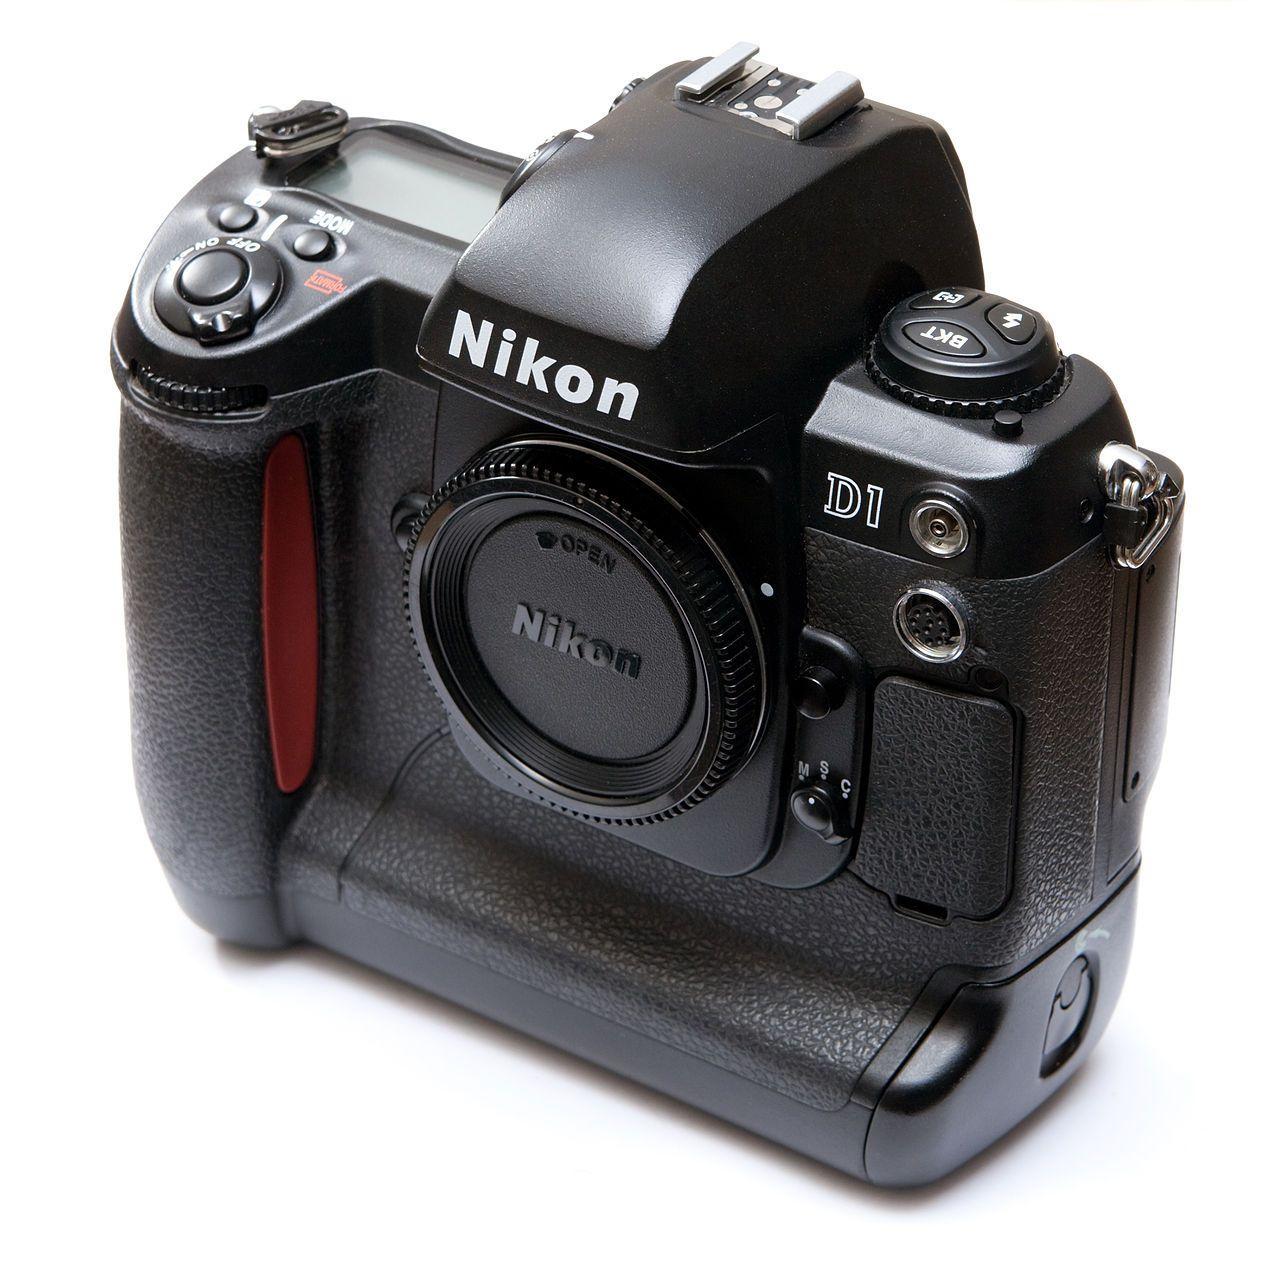 Nikon D1.Foto: Wikimedia Commons/Ashley Pomeroy